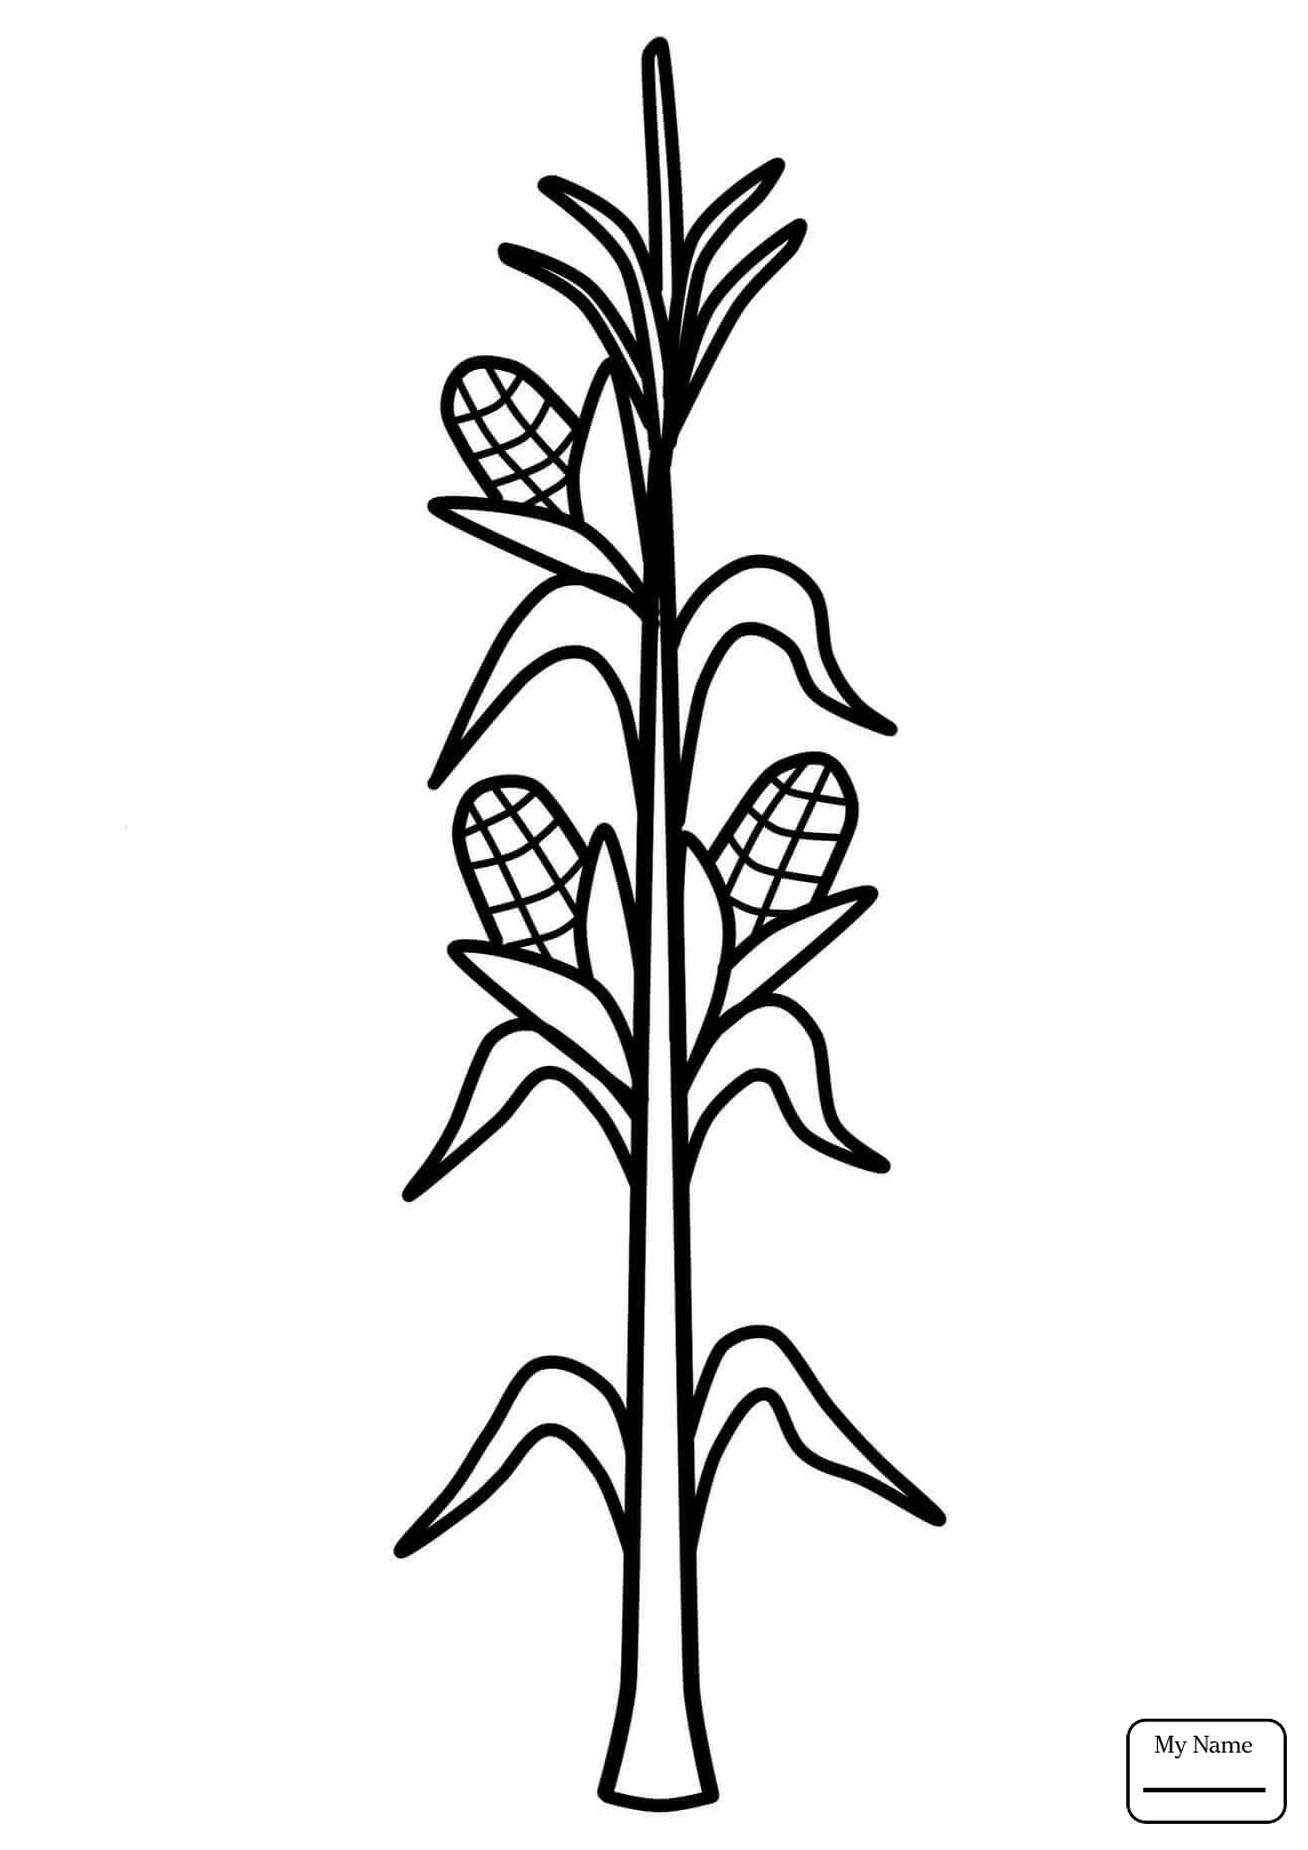 Corn Stalk Drawing At Getdrawings